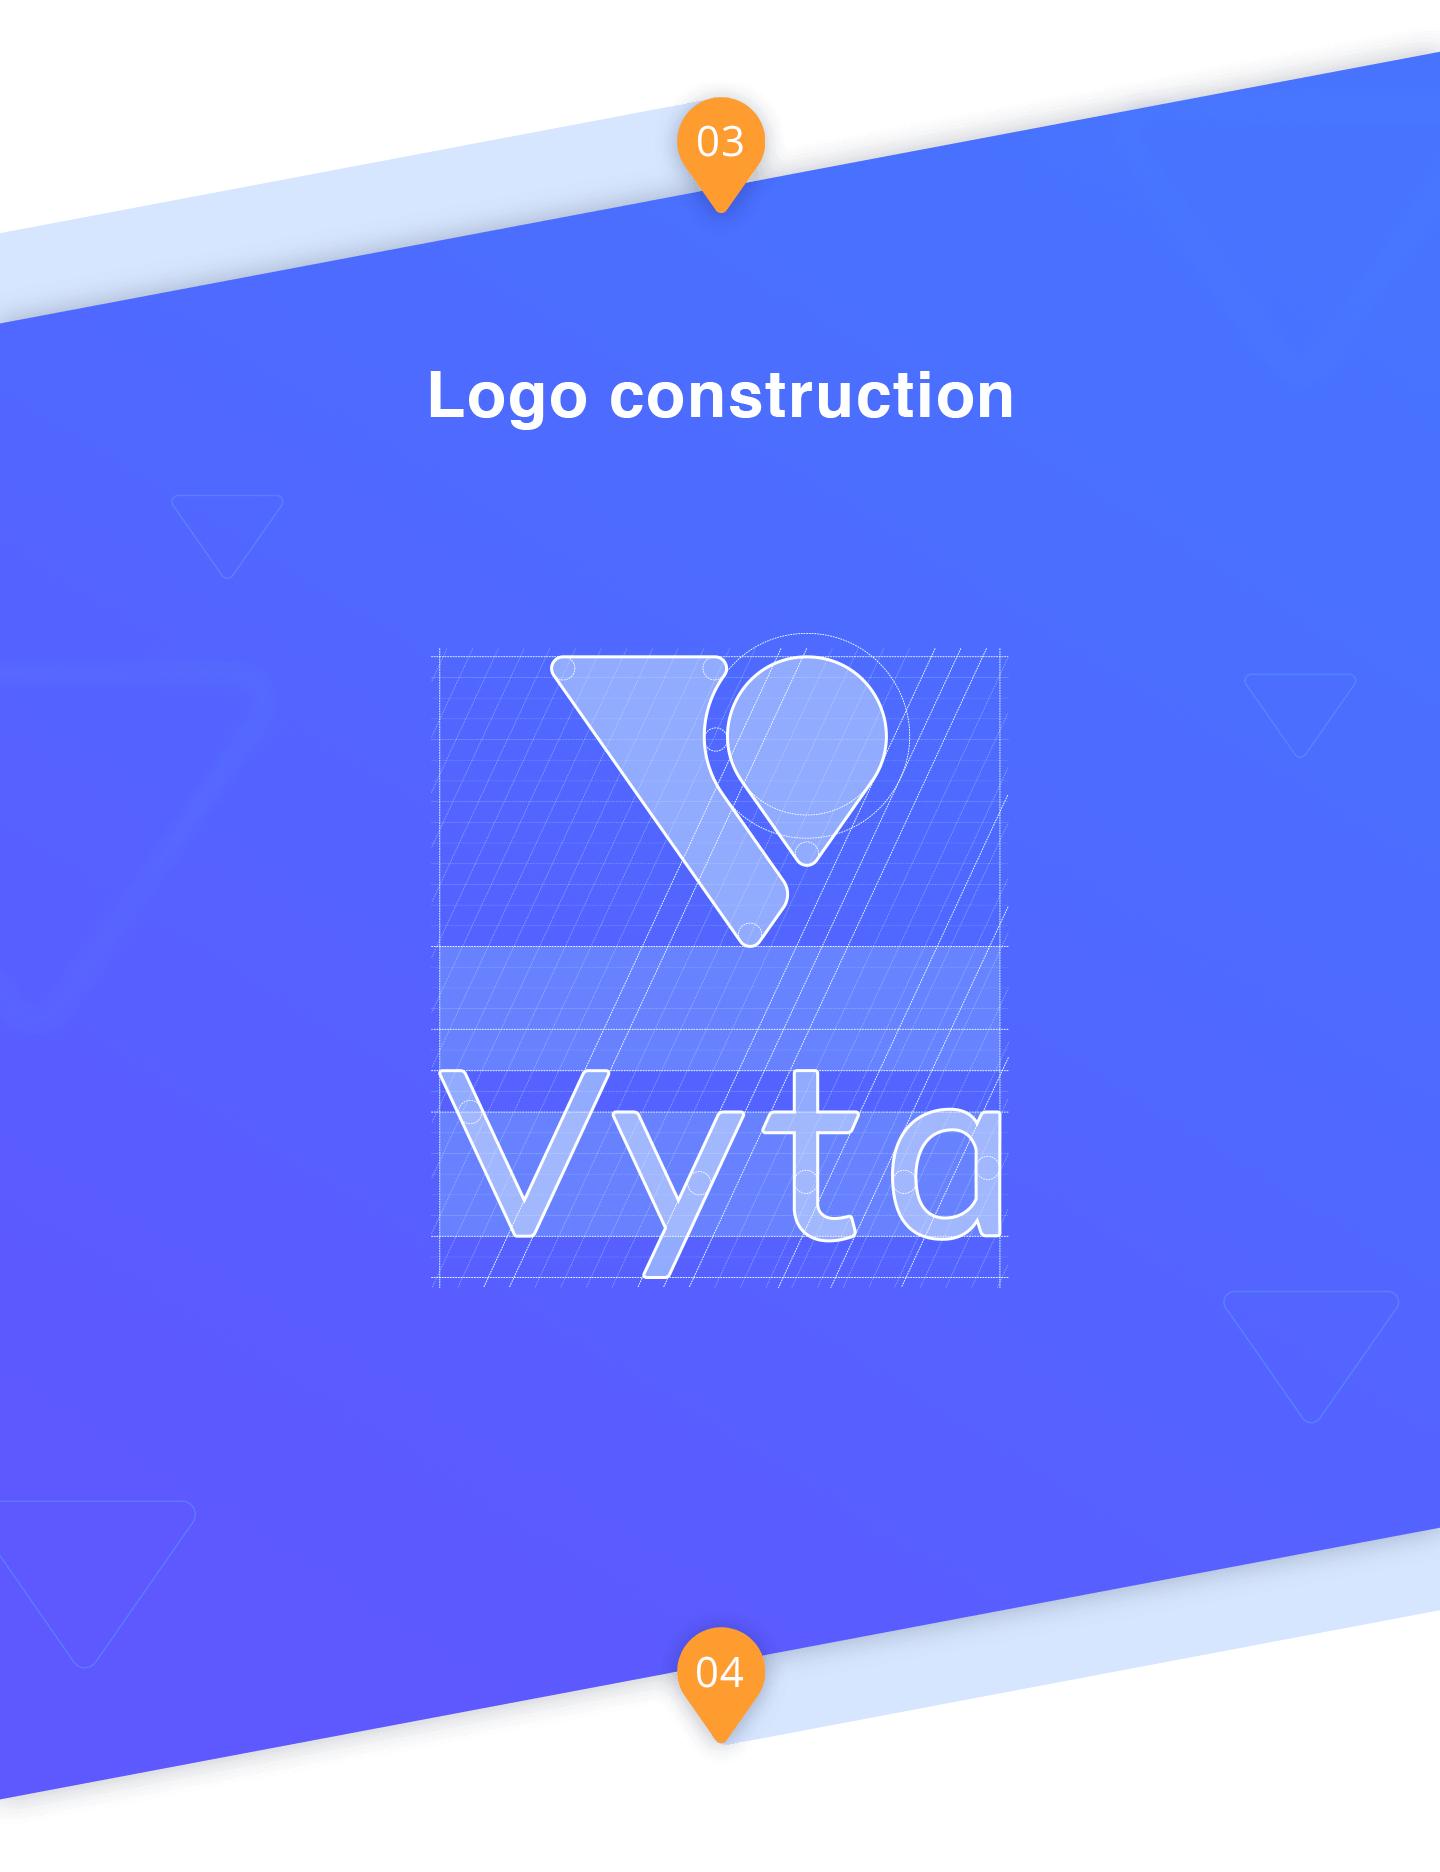 705b6d0d1dc9 Vyta App Identity and Interface Design on Behance